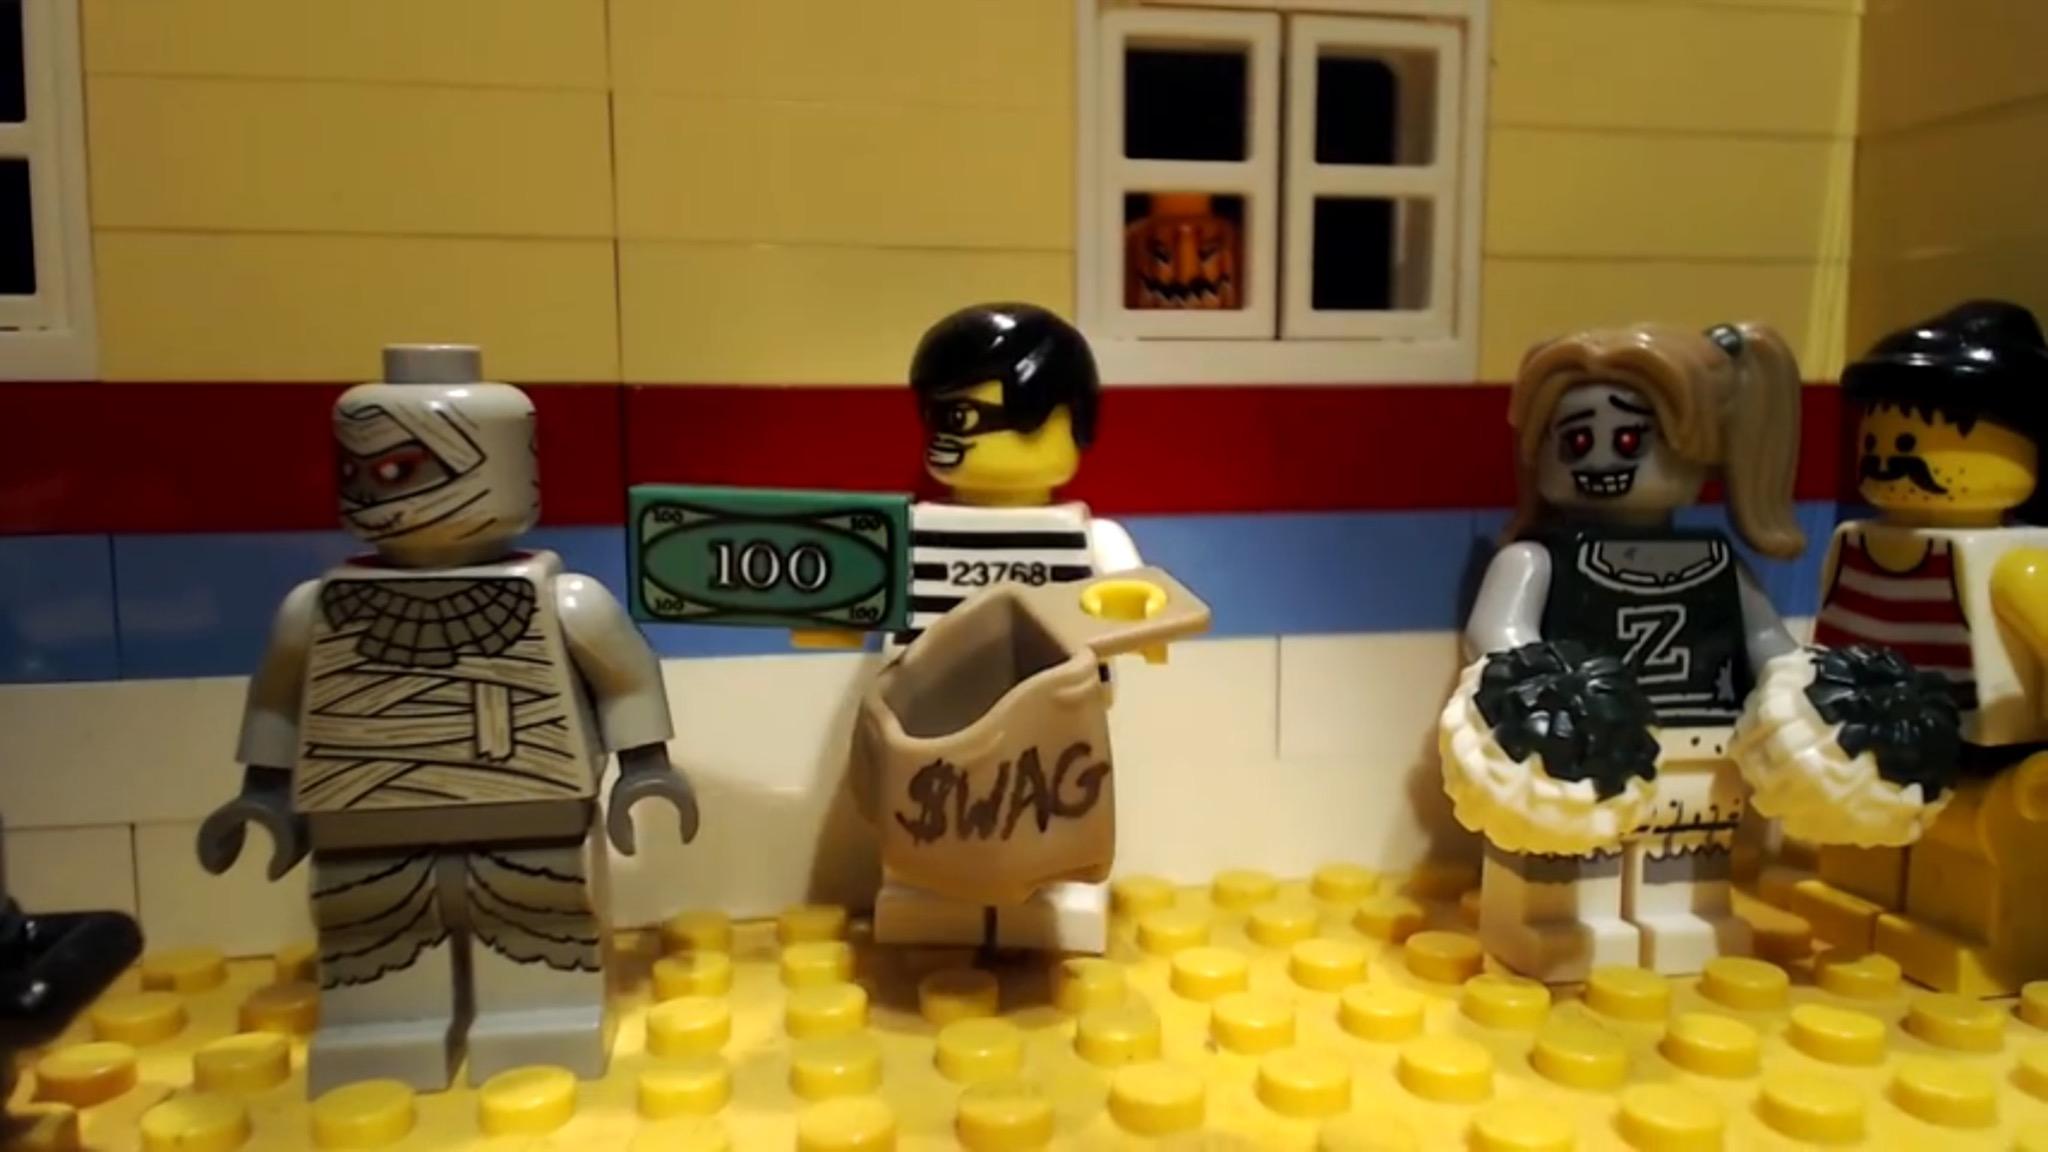 https://bricksafe.com/files/LegoSkeleton2000/brickfilm-showcase/FullSizeRender%282%29.jpg